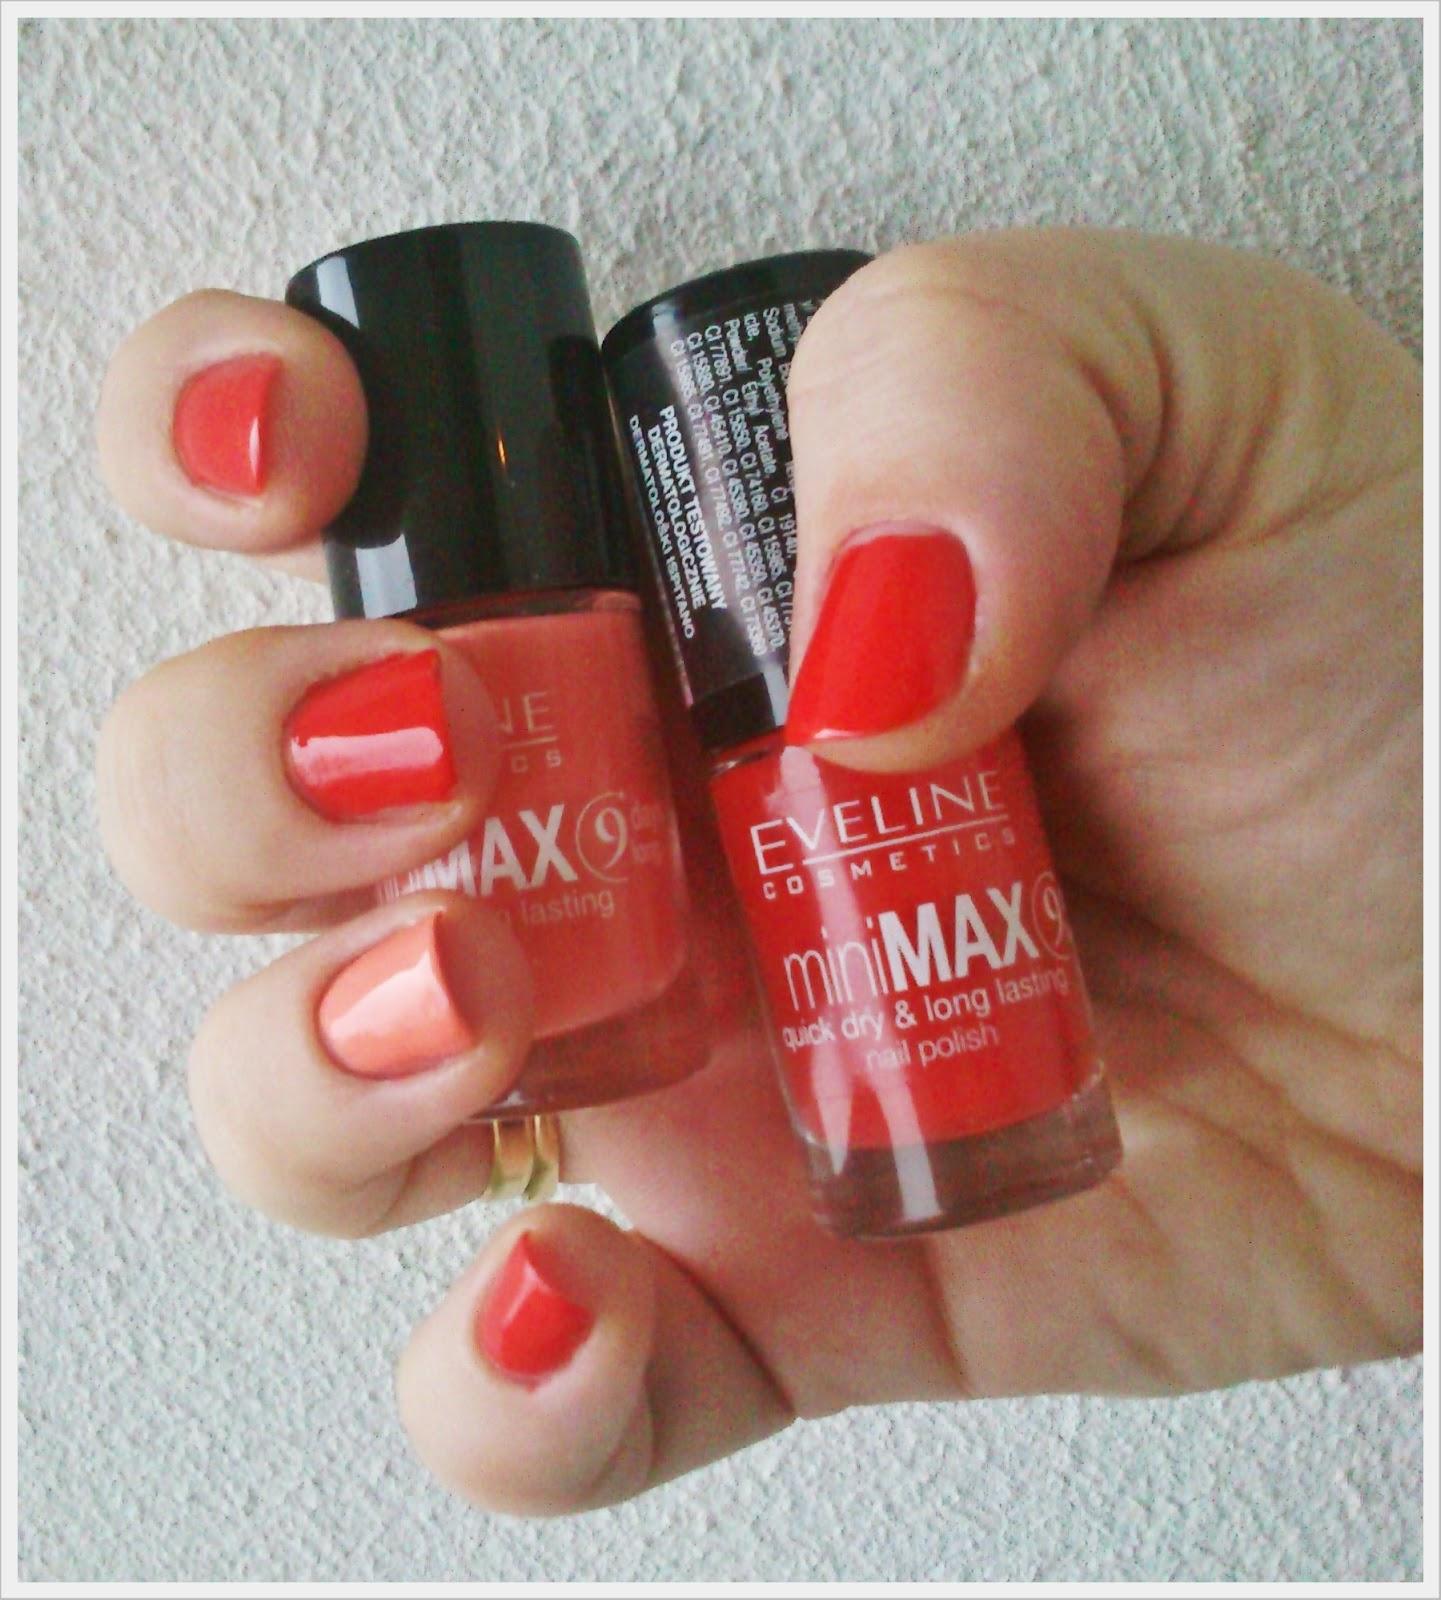 EVELINE MINI MAX QUICK DRY & LONG LASTING - 801, 844 + WYNIKI